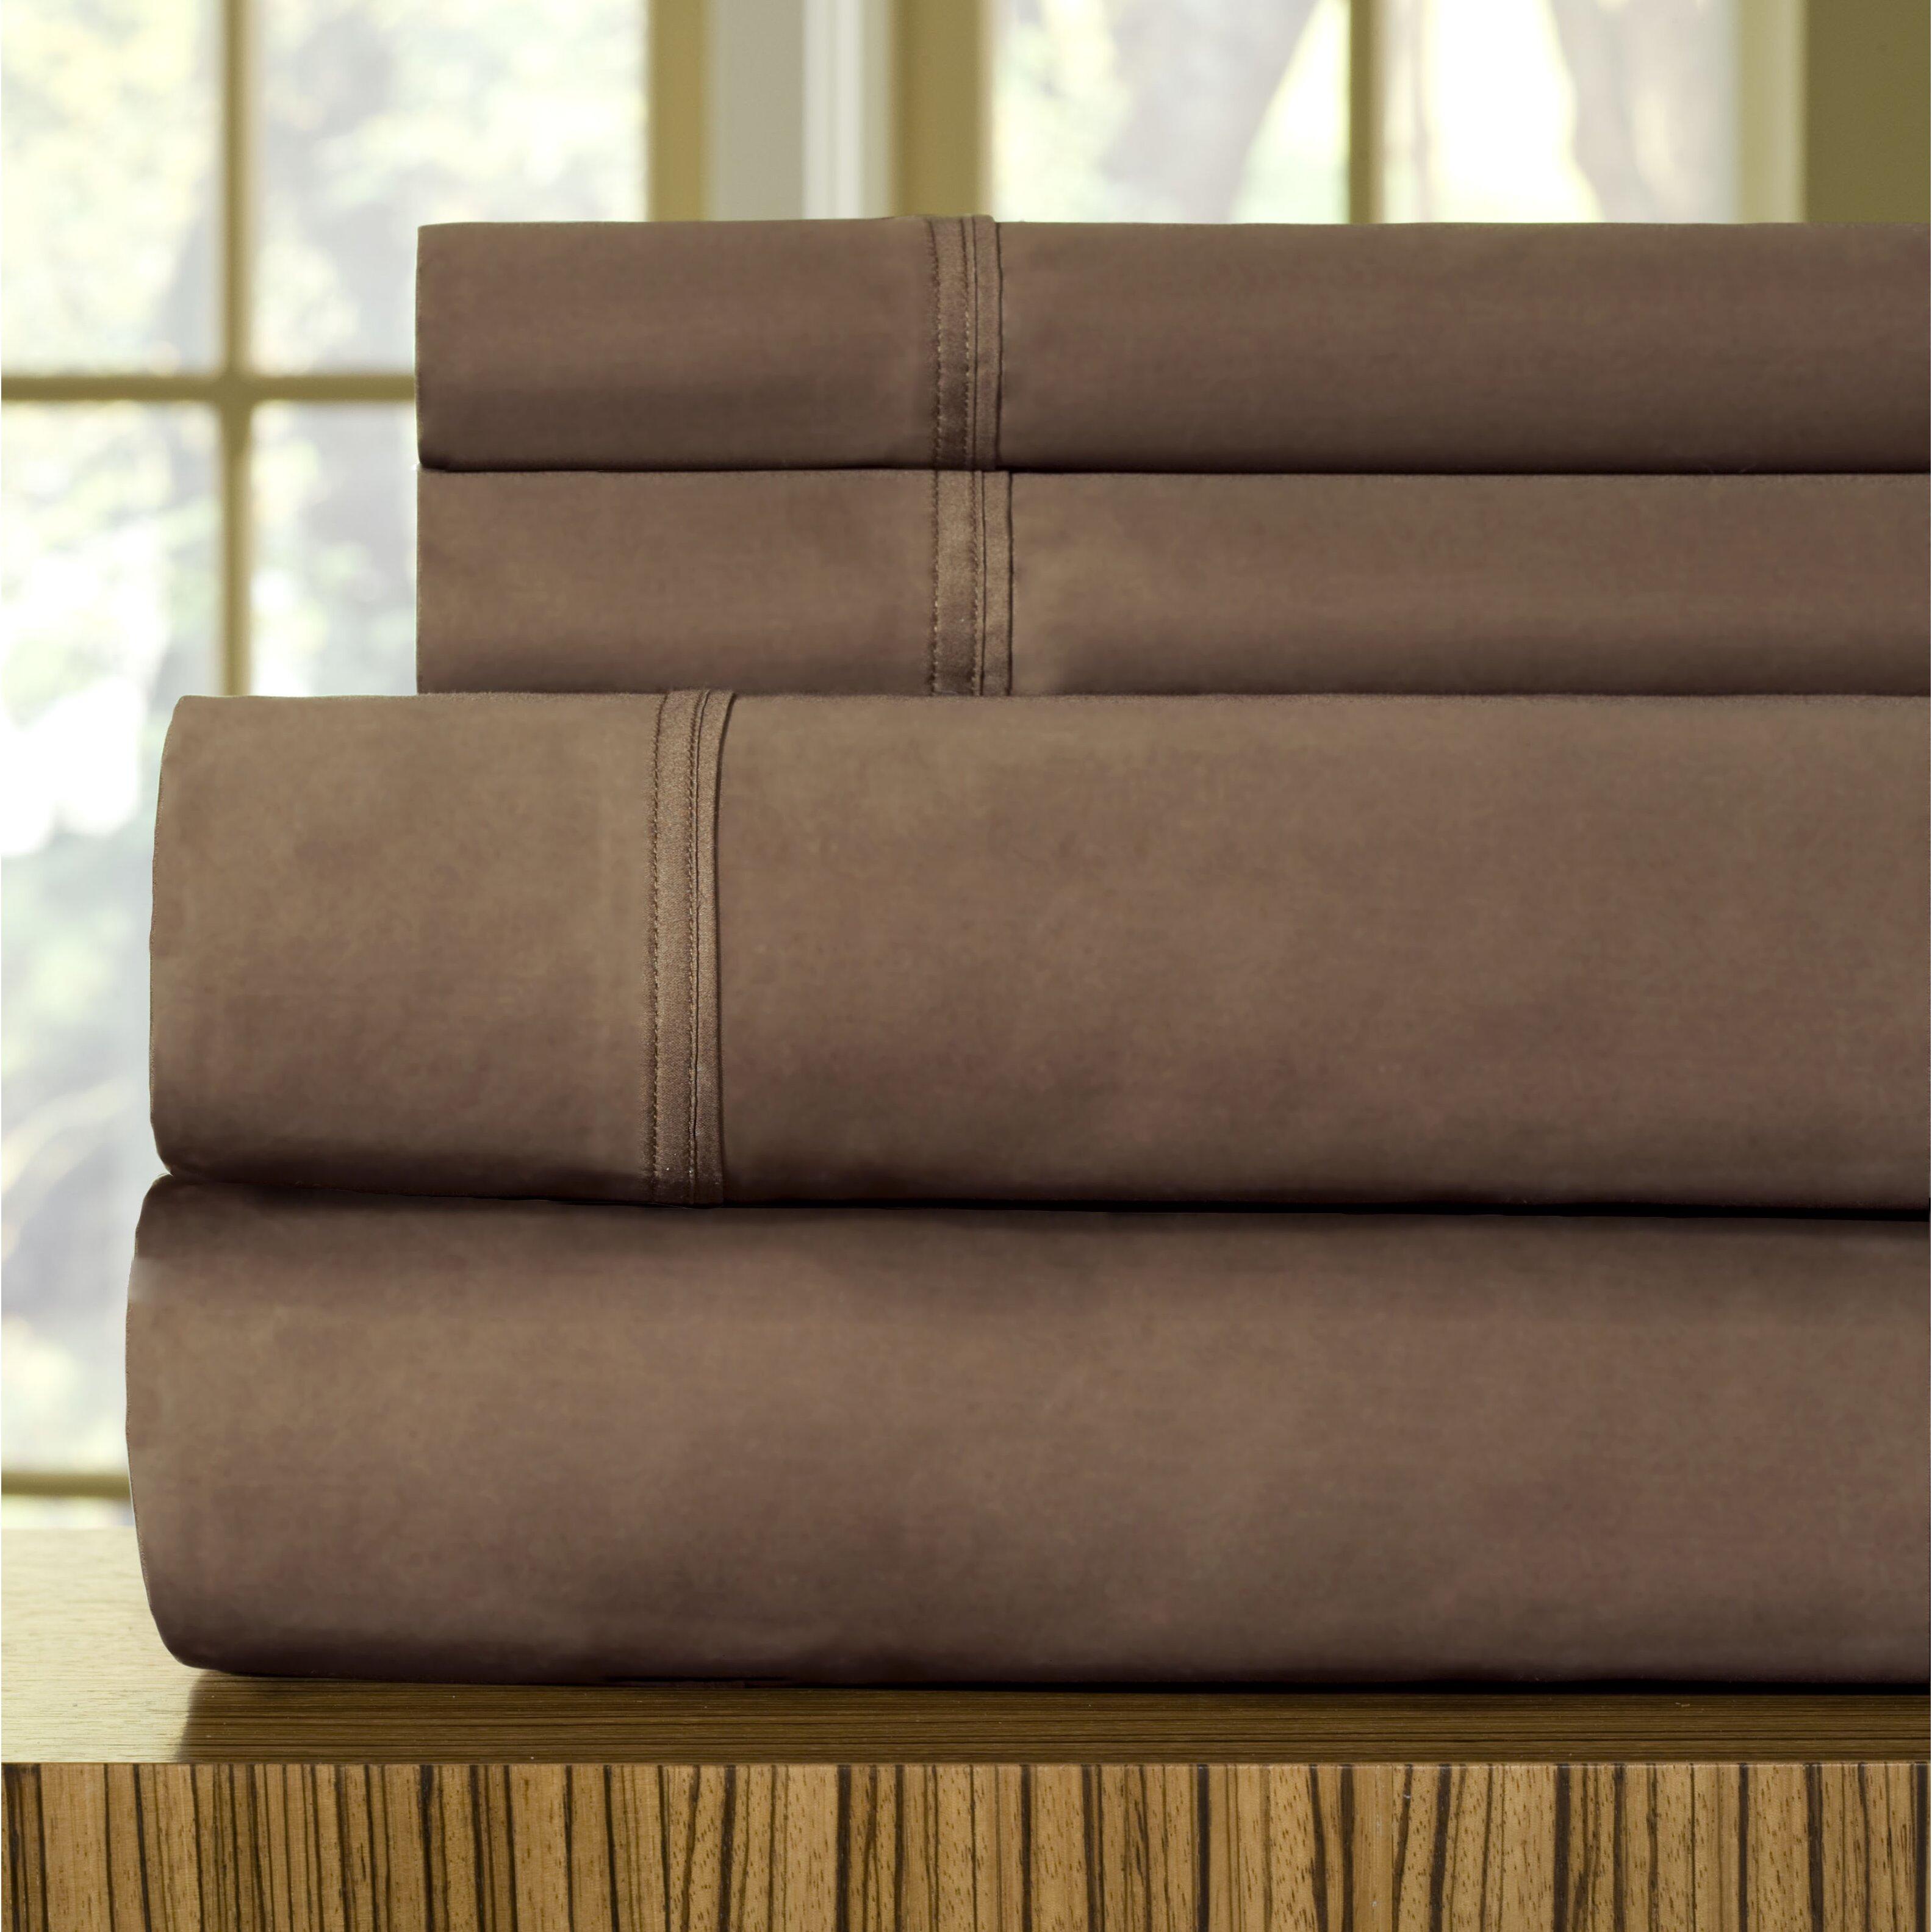 Celeste home 510 thread count egyptian cotton sheet set for What thread count is best for egyptian cotton sheets